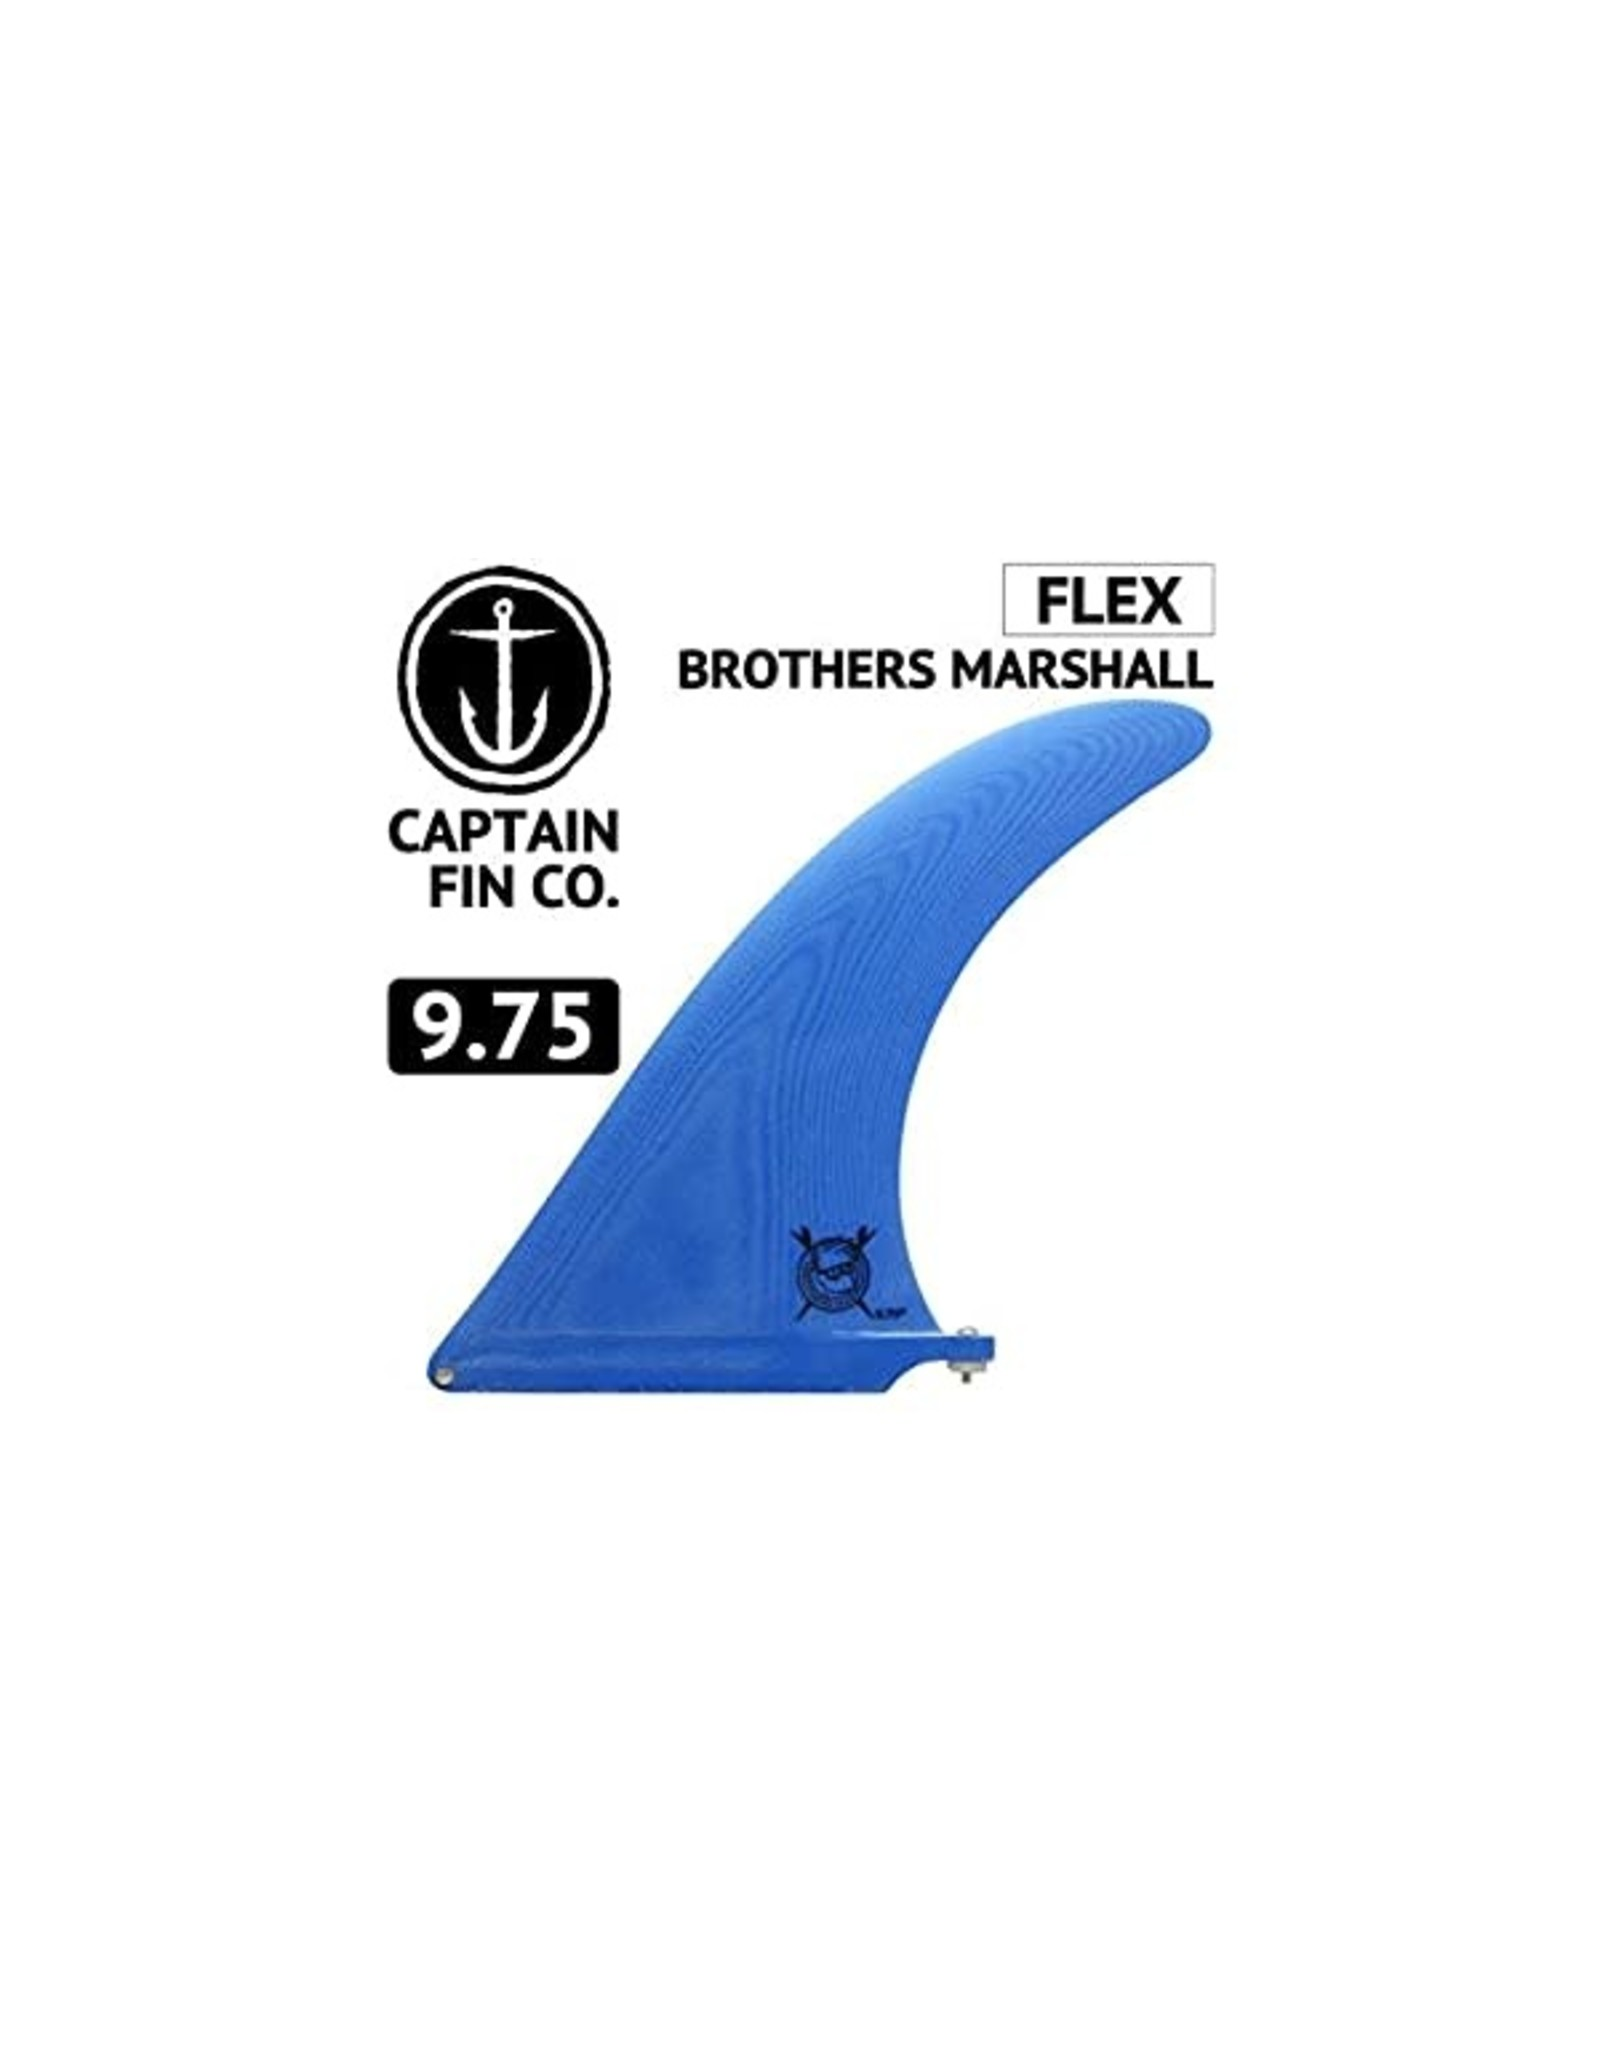 "Captain Fin Catain Fin 9.75"" Brothers Marshall Flex"